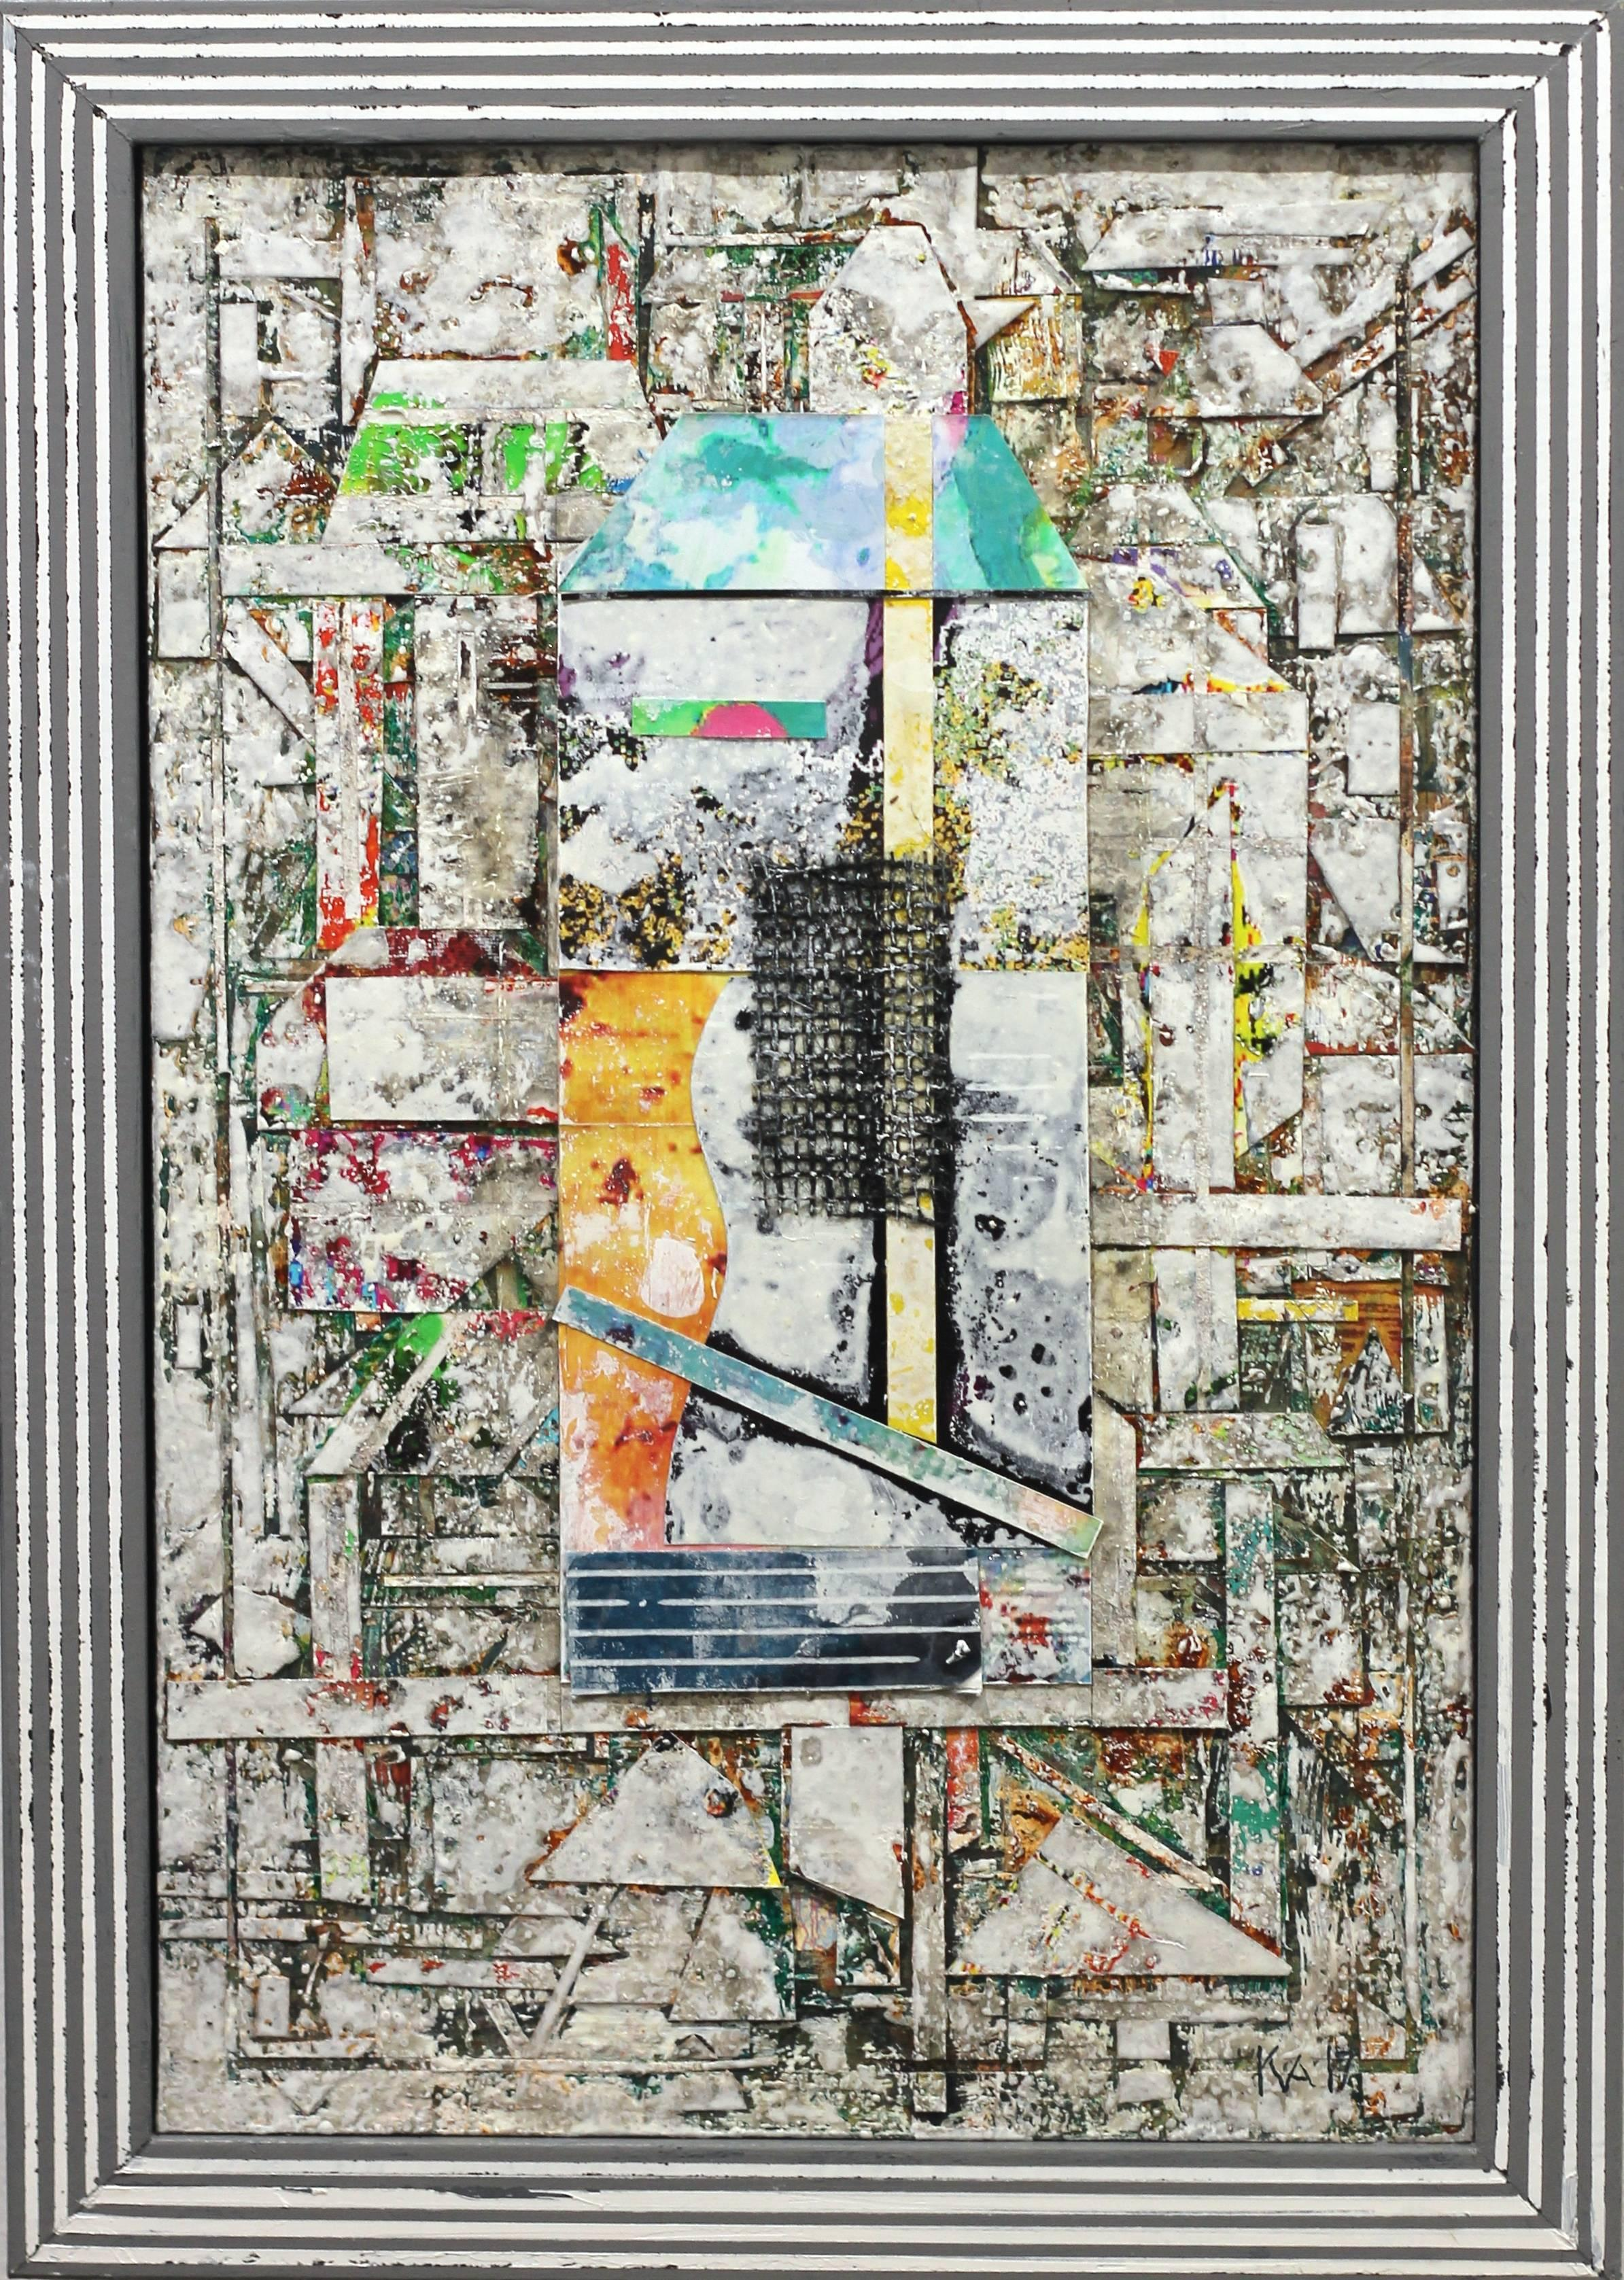 Sublime 758 - Framed original three-dimensional photographic collage artwork